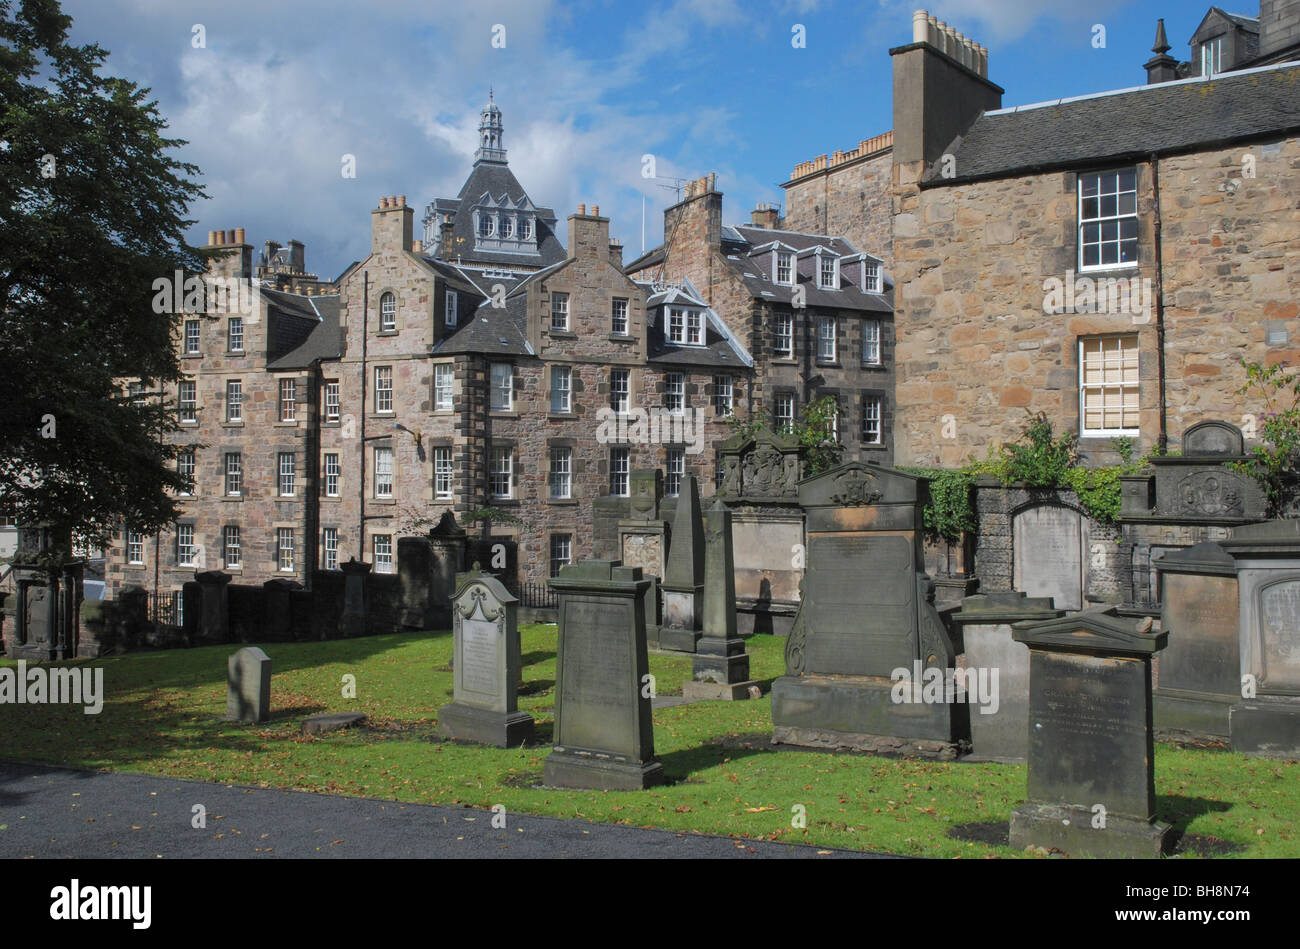 Greyfriars Kirkyard in Edinburgh's Old Town. Stock Photo